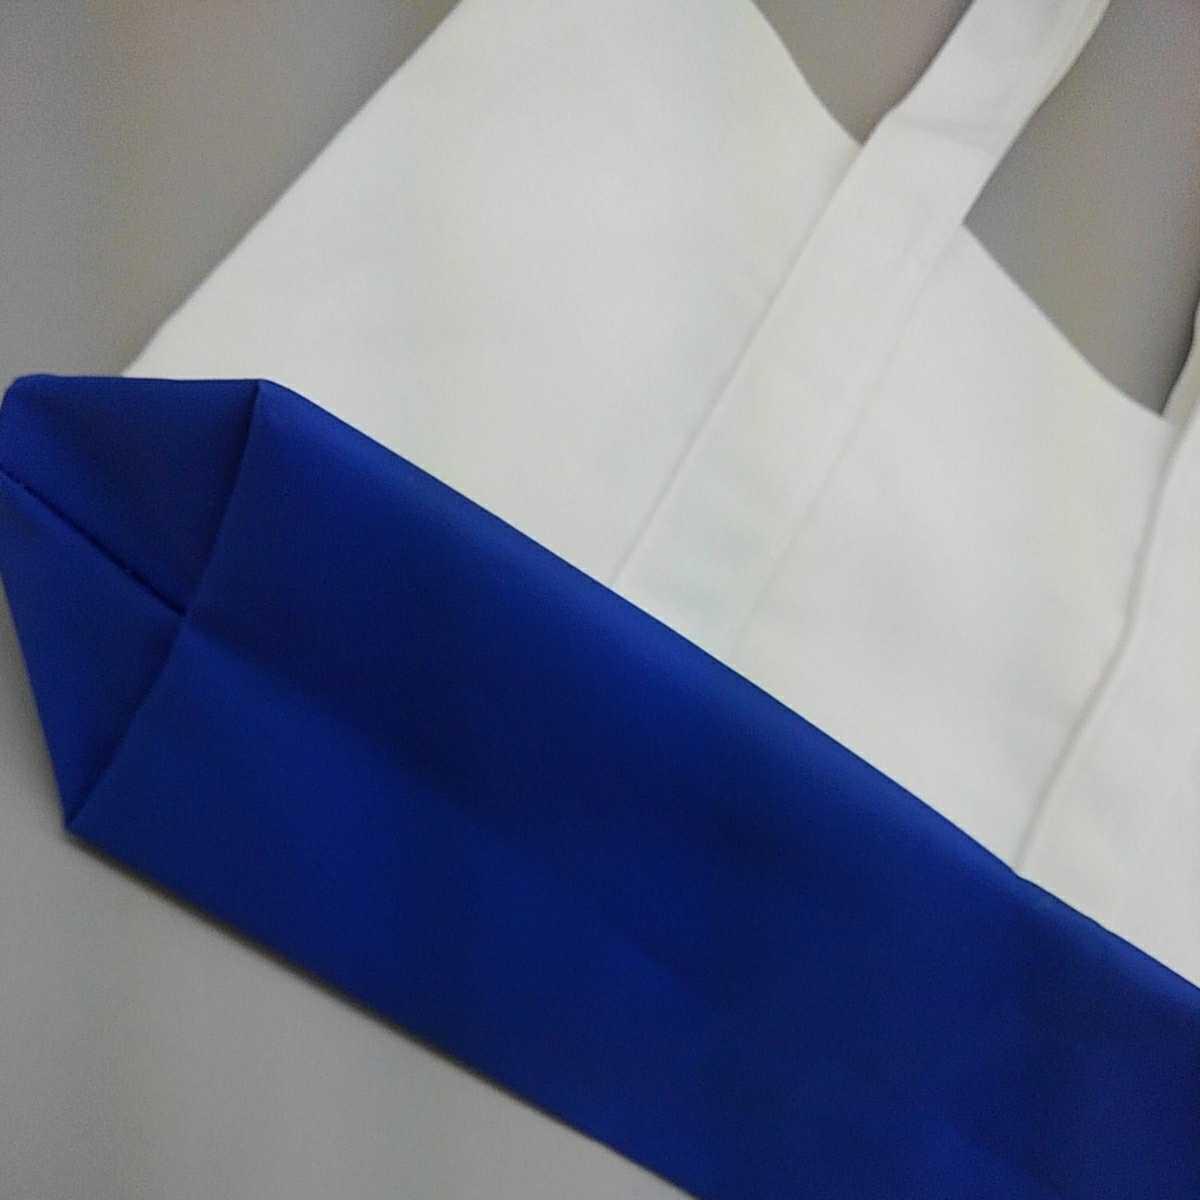 ◇BMW ノベルティートートバッグ 白×青 非売品 未使用◇_画像3